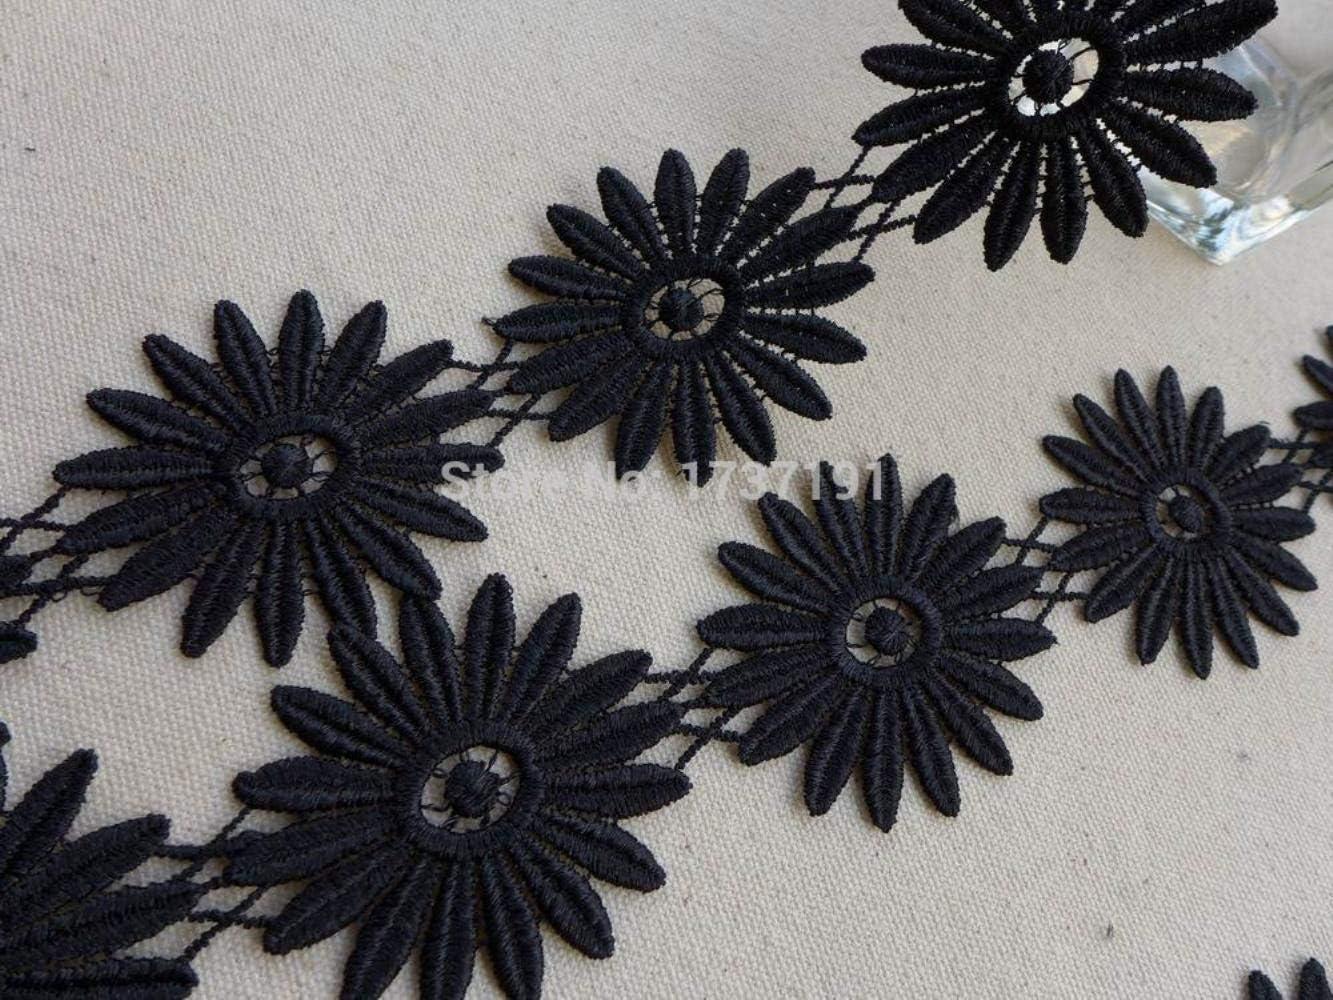 negro Gerbera Blume 5 Yards Black Venise Lace Trim joyas o Kost/ümdesign Gerbera Daisy Lace Applique